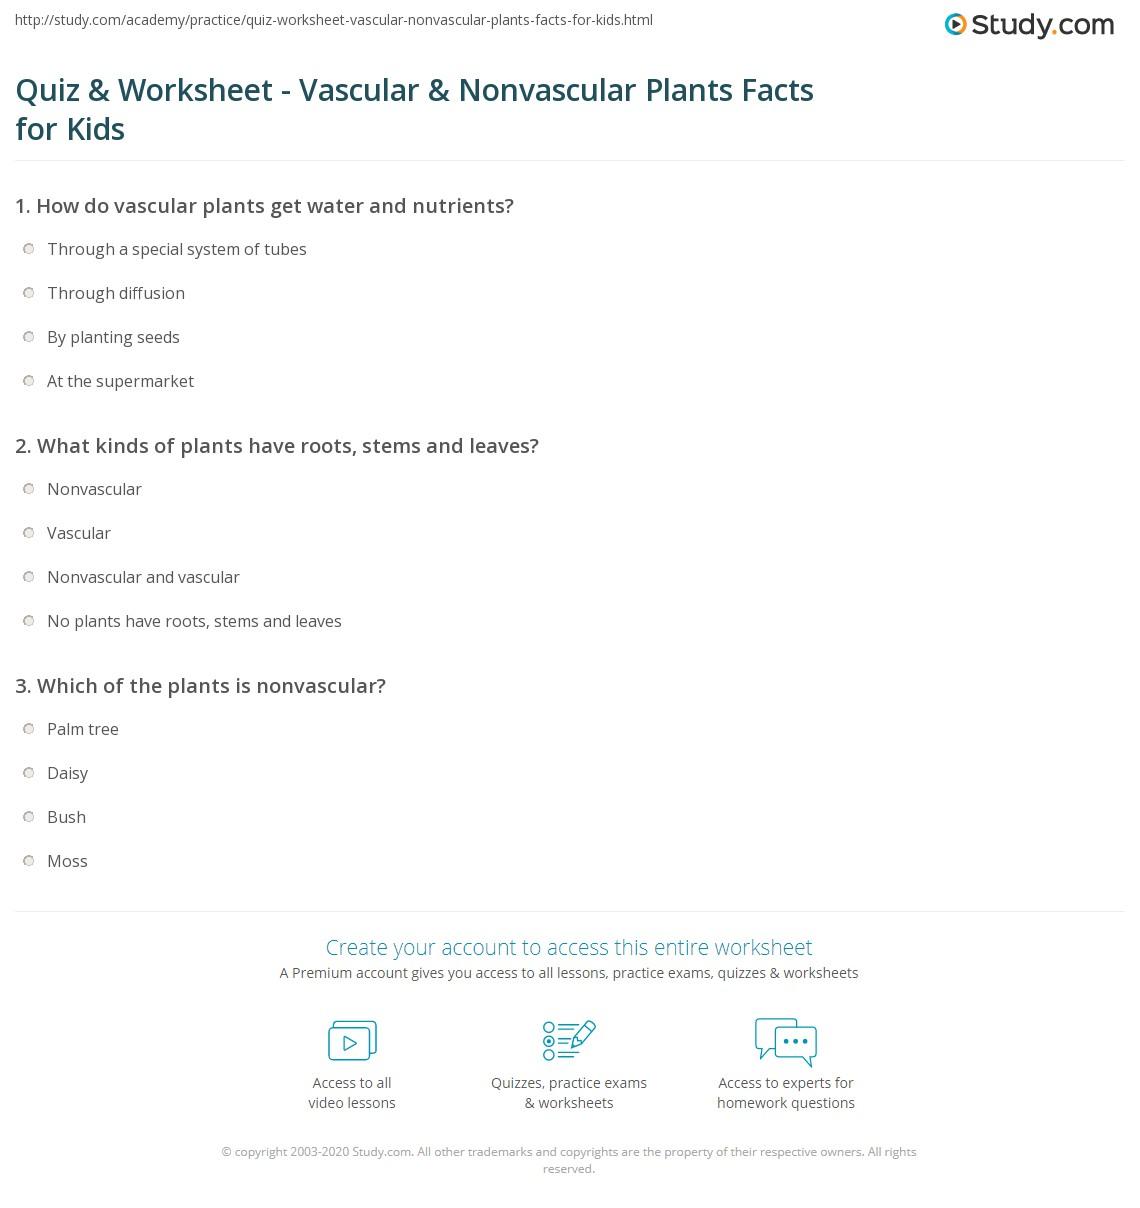 Uncategorized Vascular And Nonvascular Plants Worksheet quiz worksheet vascular nonvascular plants facts for kids print lesson worksheet